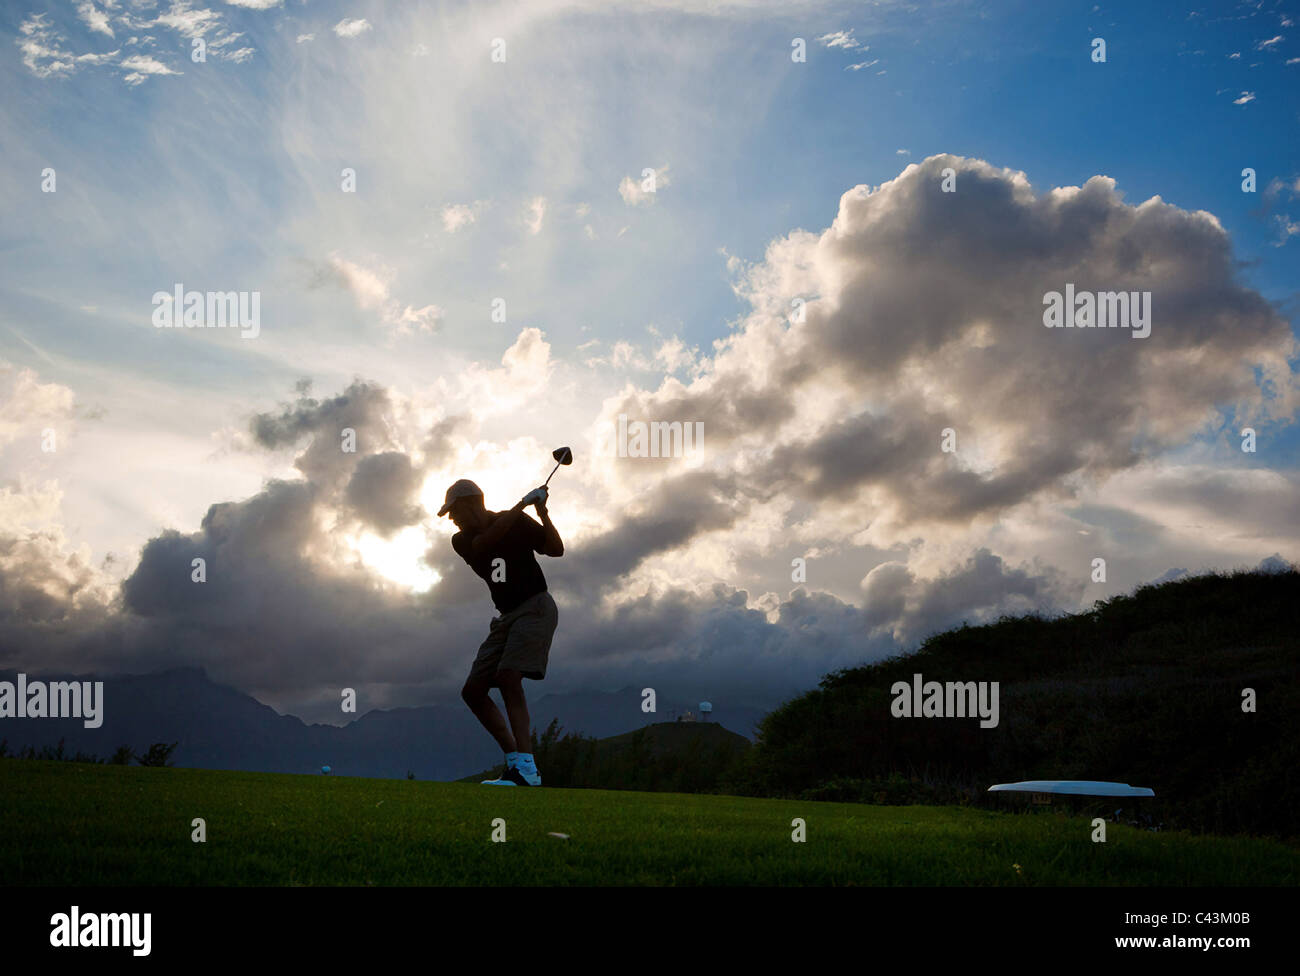 Il presidente Barack Obama gioca a golf presso il campo da Kaneohe Klipper Marine Golf in Oahu, Hawaii, Dic 26, Immagini Stock